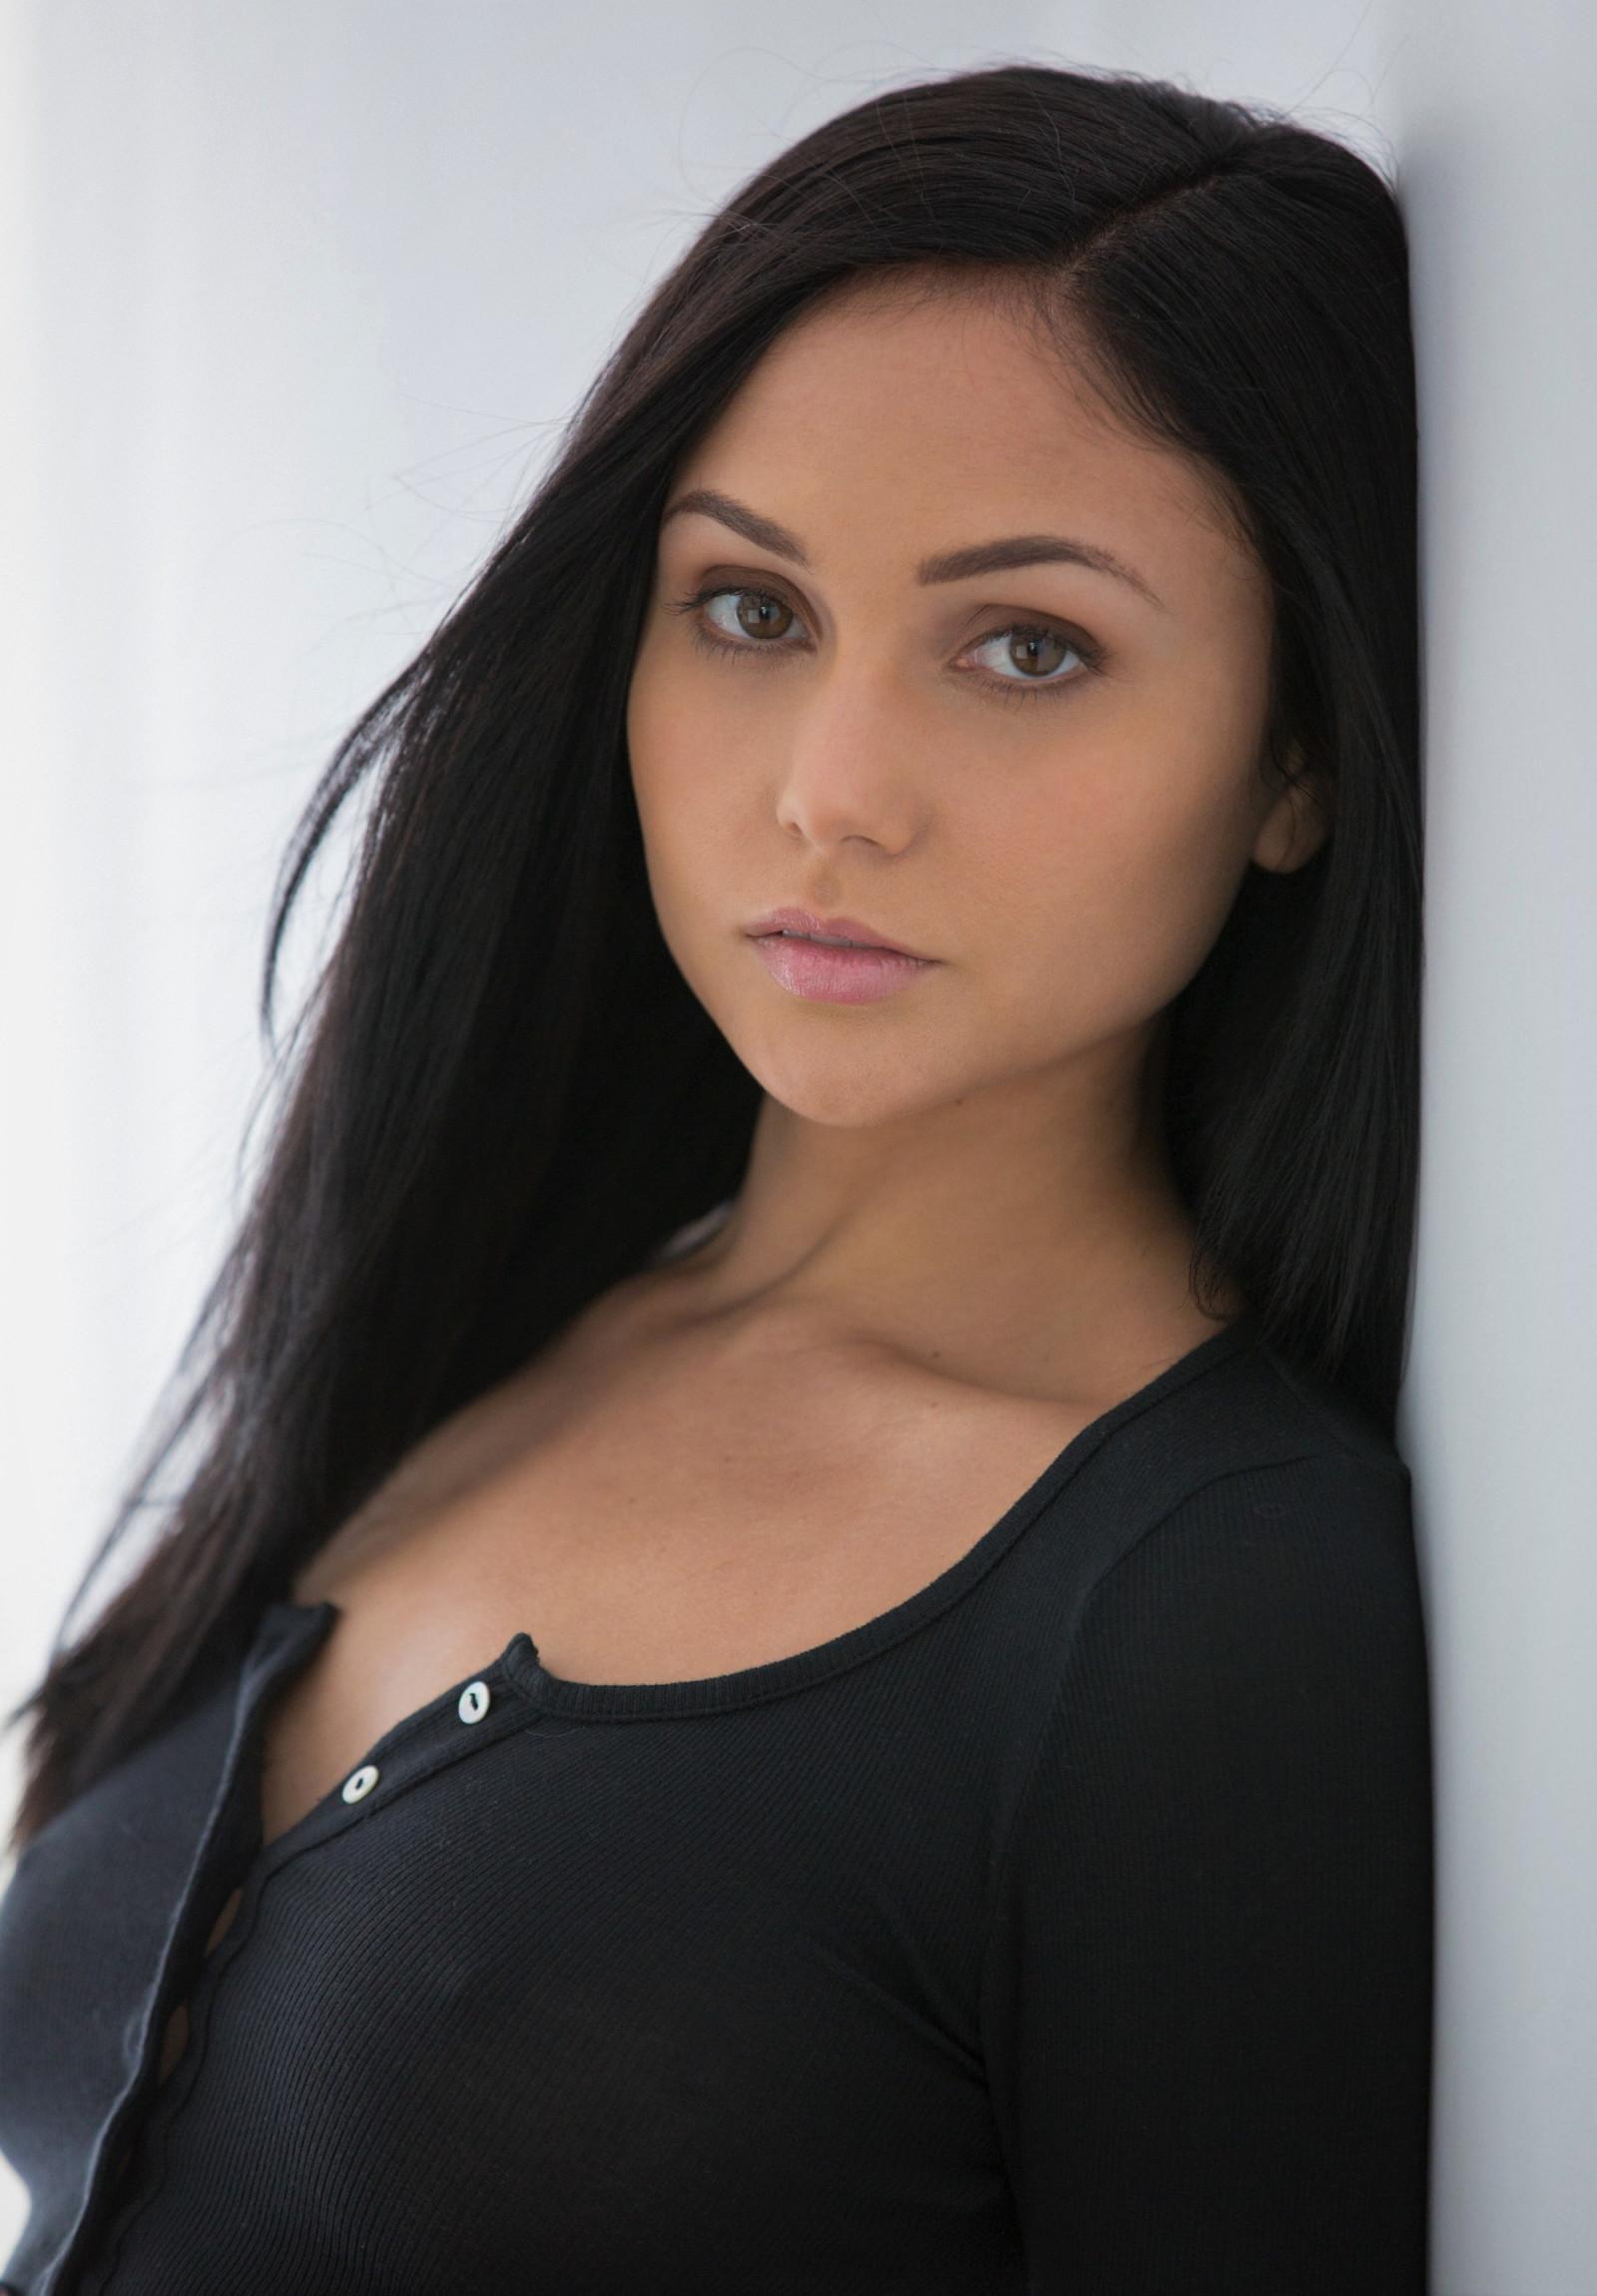 Wallpaper : Ariana Marie, model, women, pornstar, actress